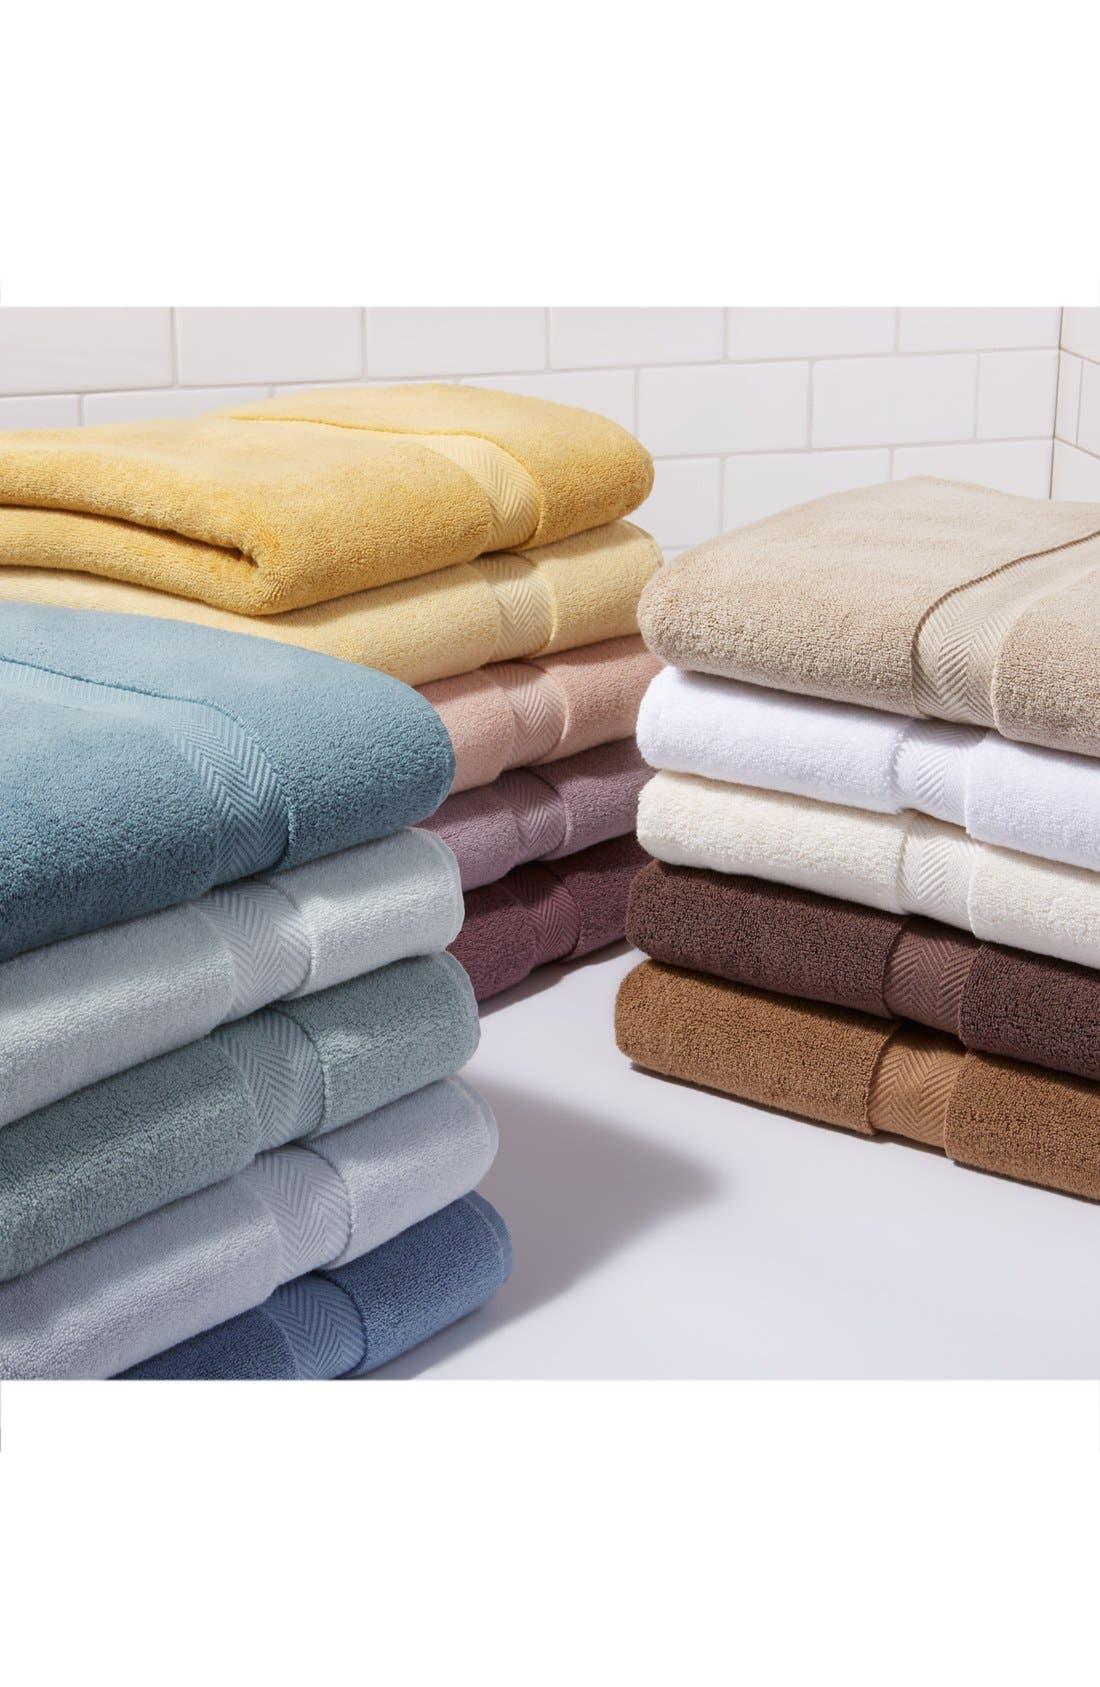 Hydrocotton Bath Towel,                             Alternate thumbnail 4, color,                             061